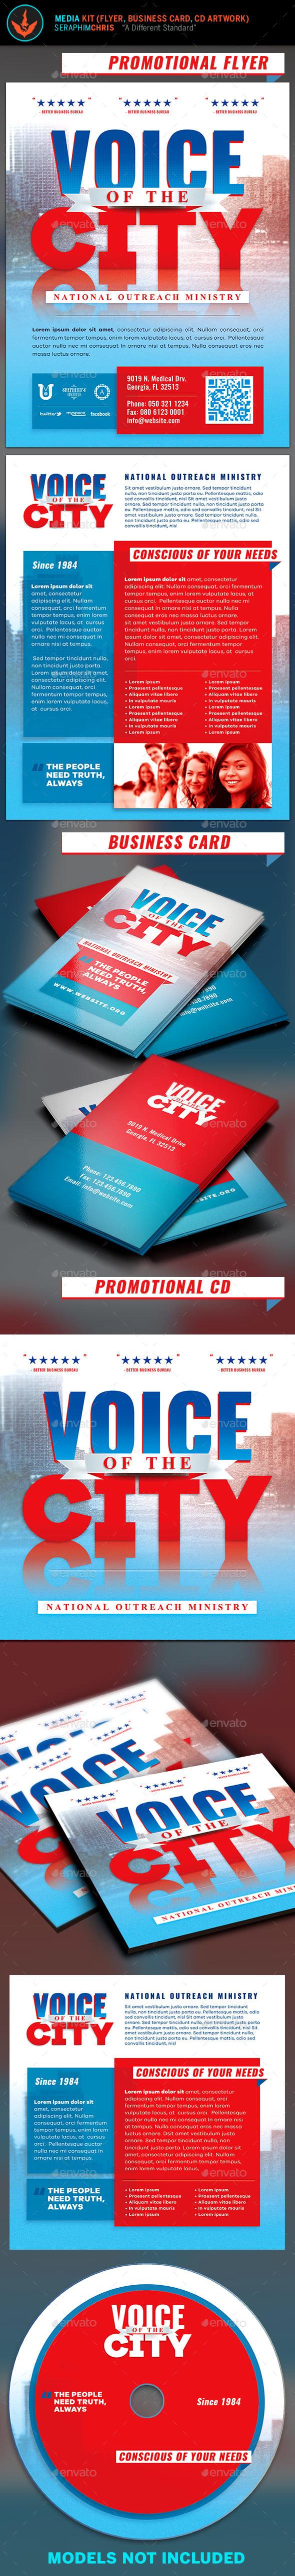 Voice of The City Church Charity Media Kit - Church Flyers